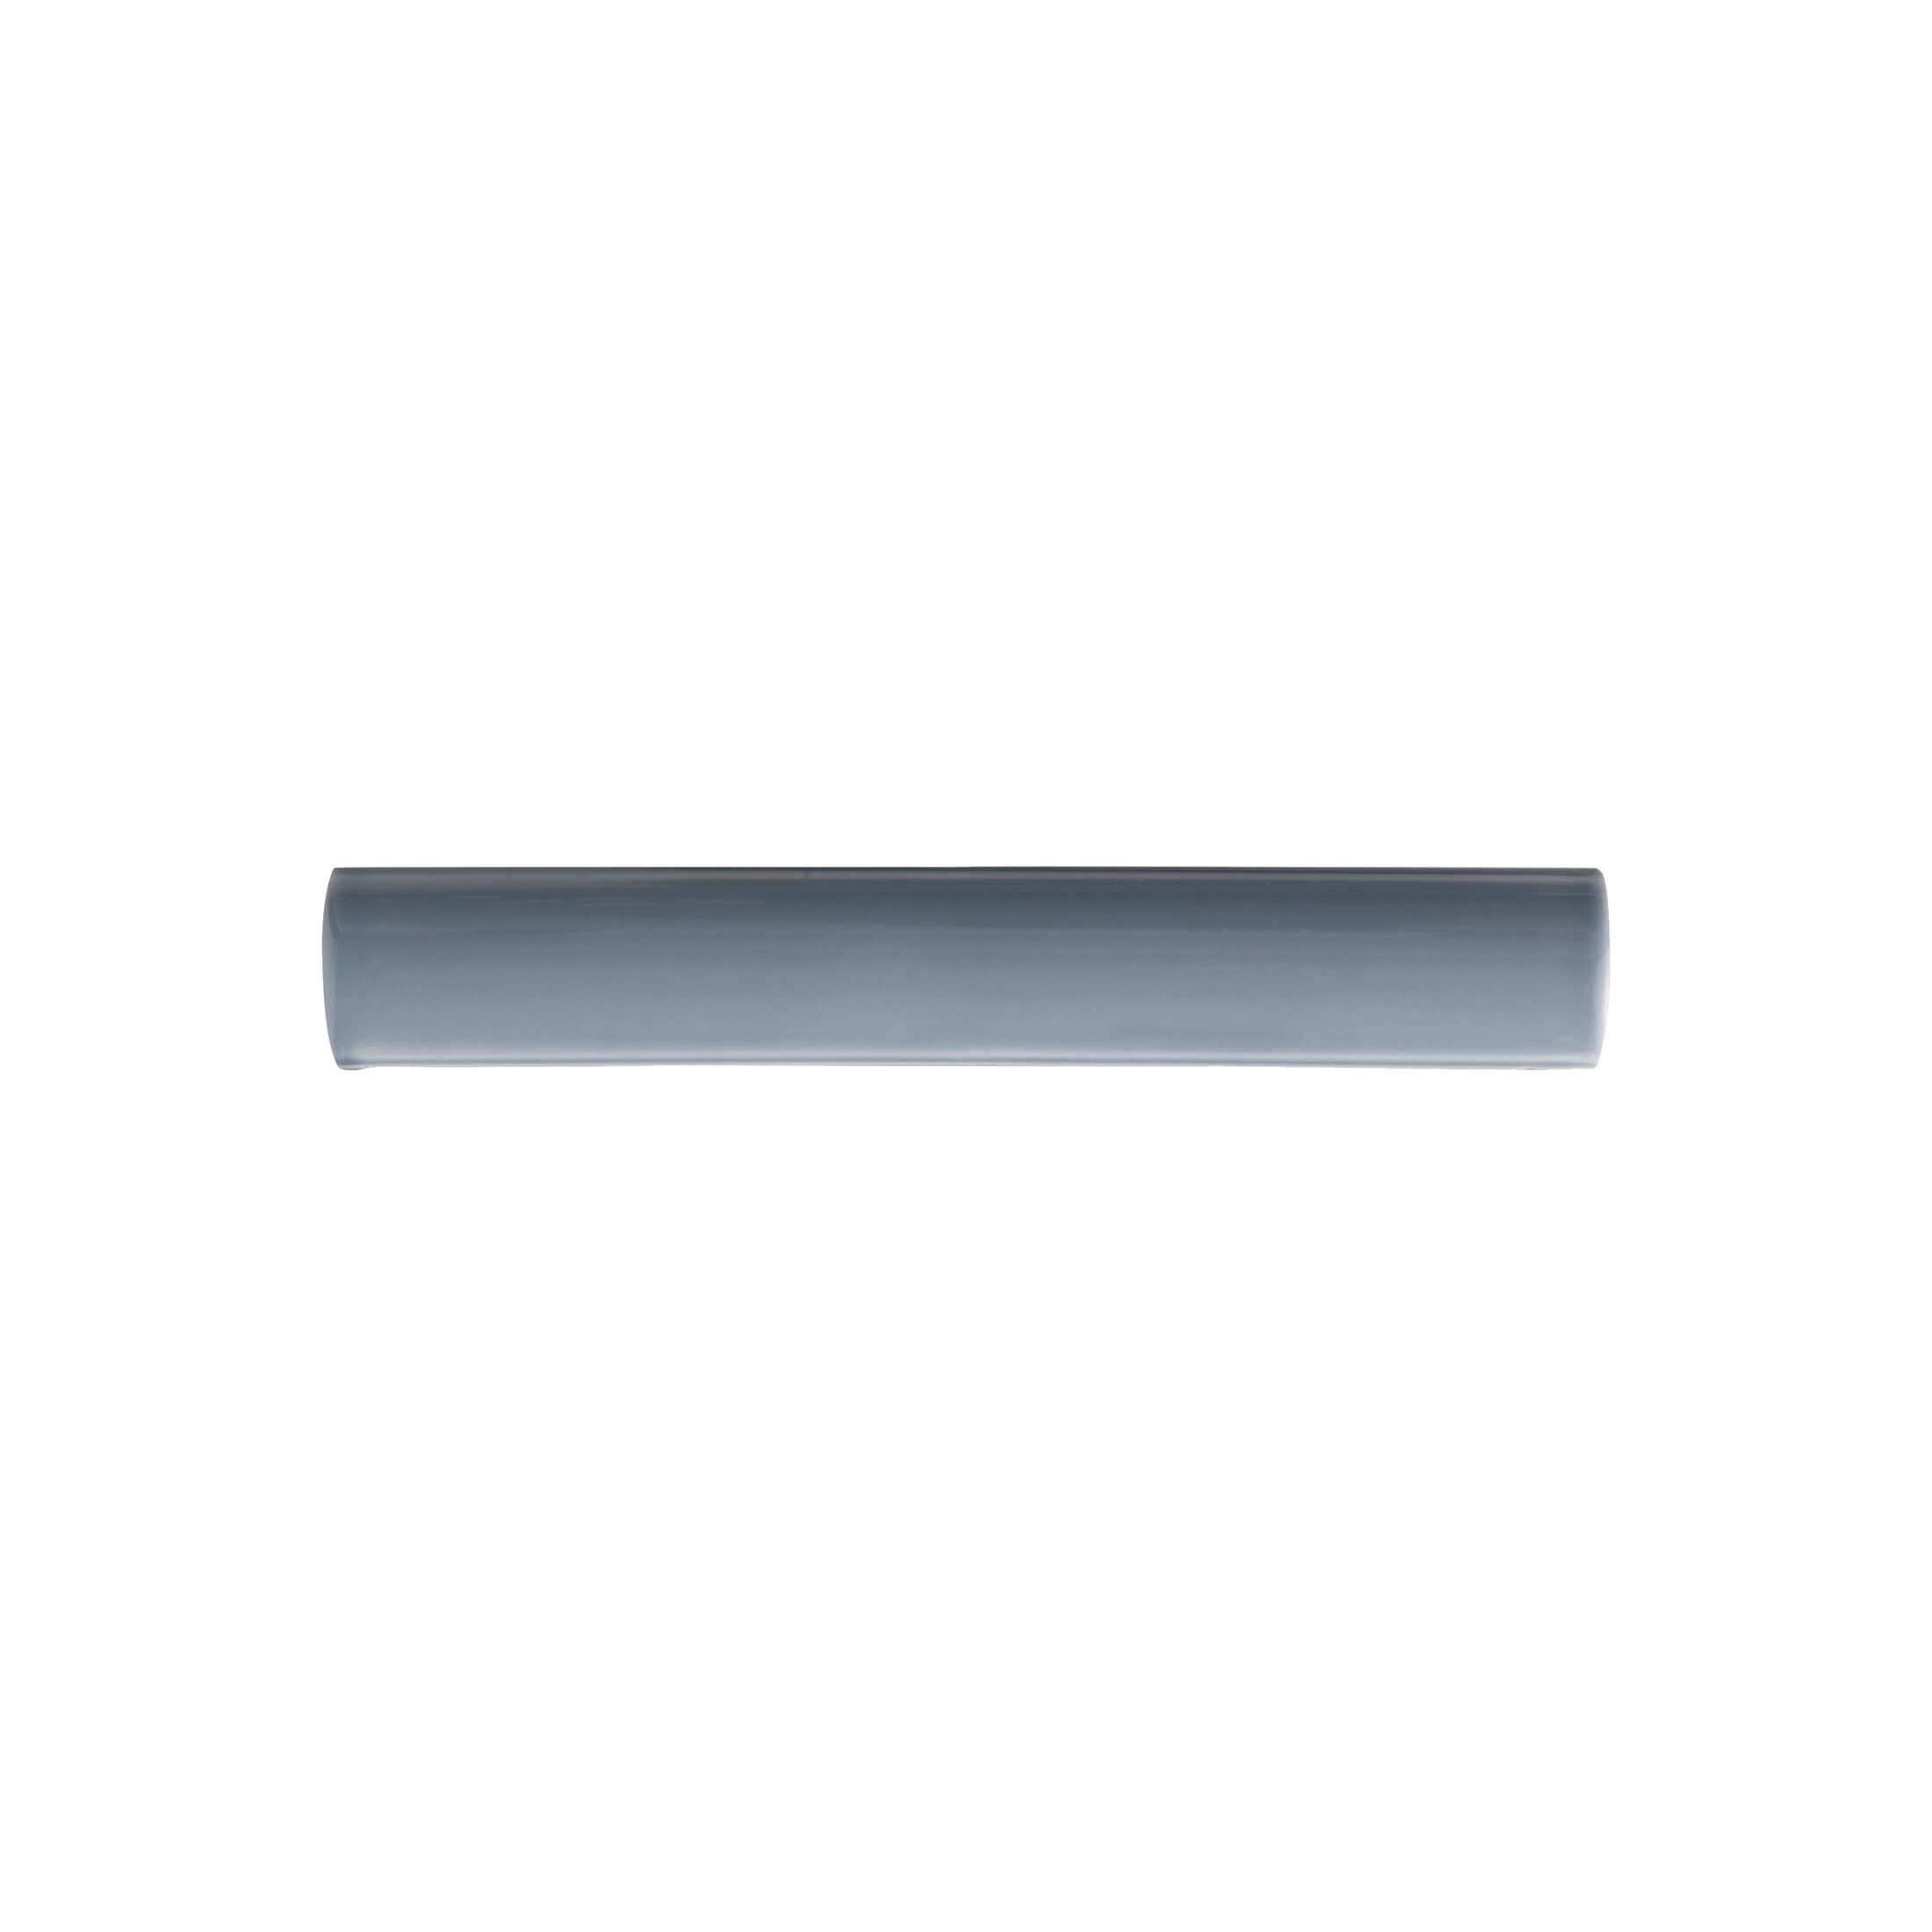 ADNE5588 - BARRA LISA - 3 cm X 20 cm